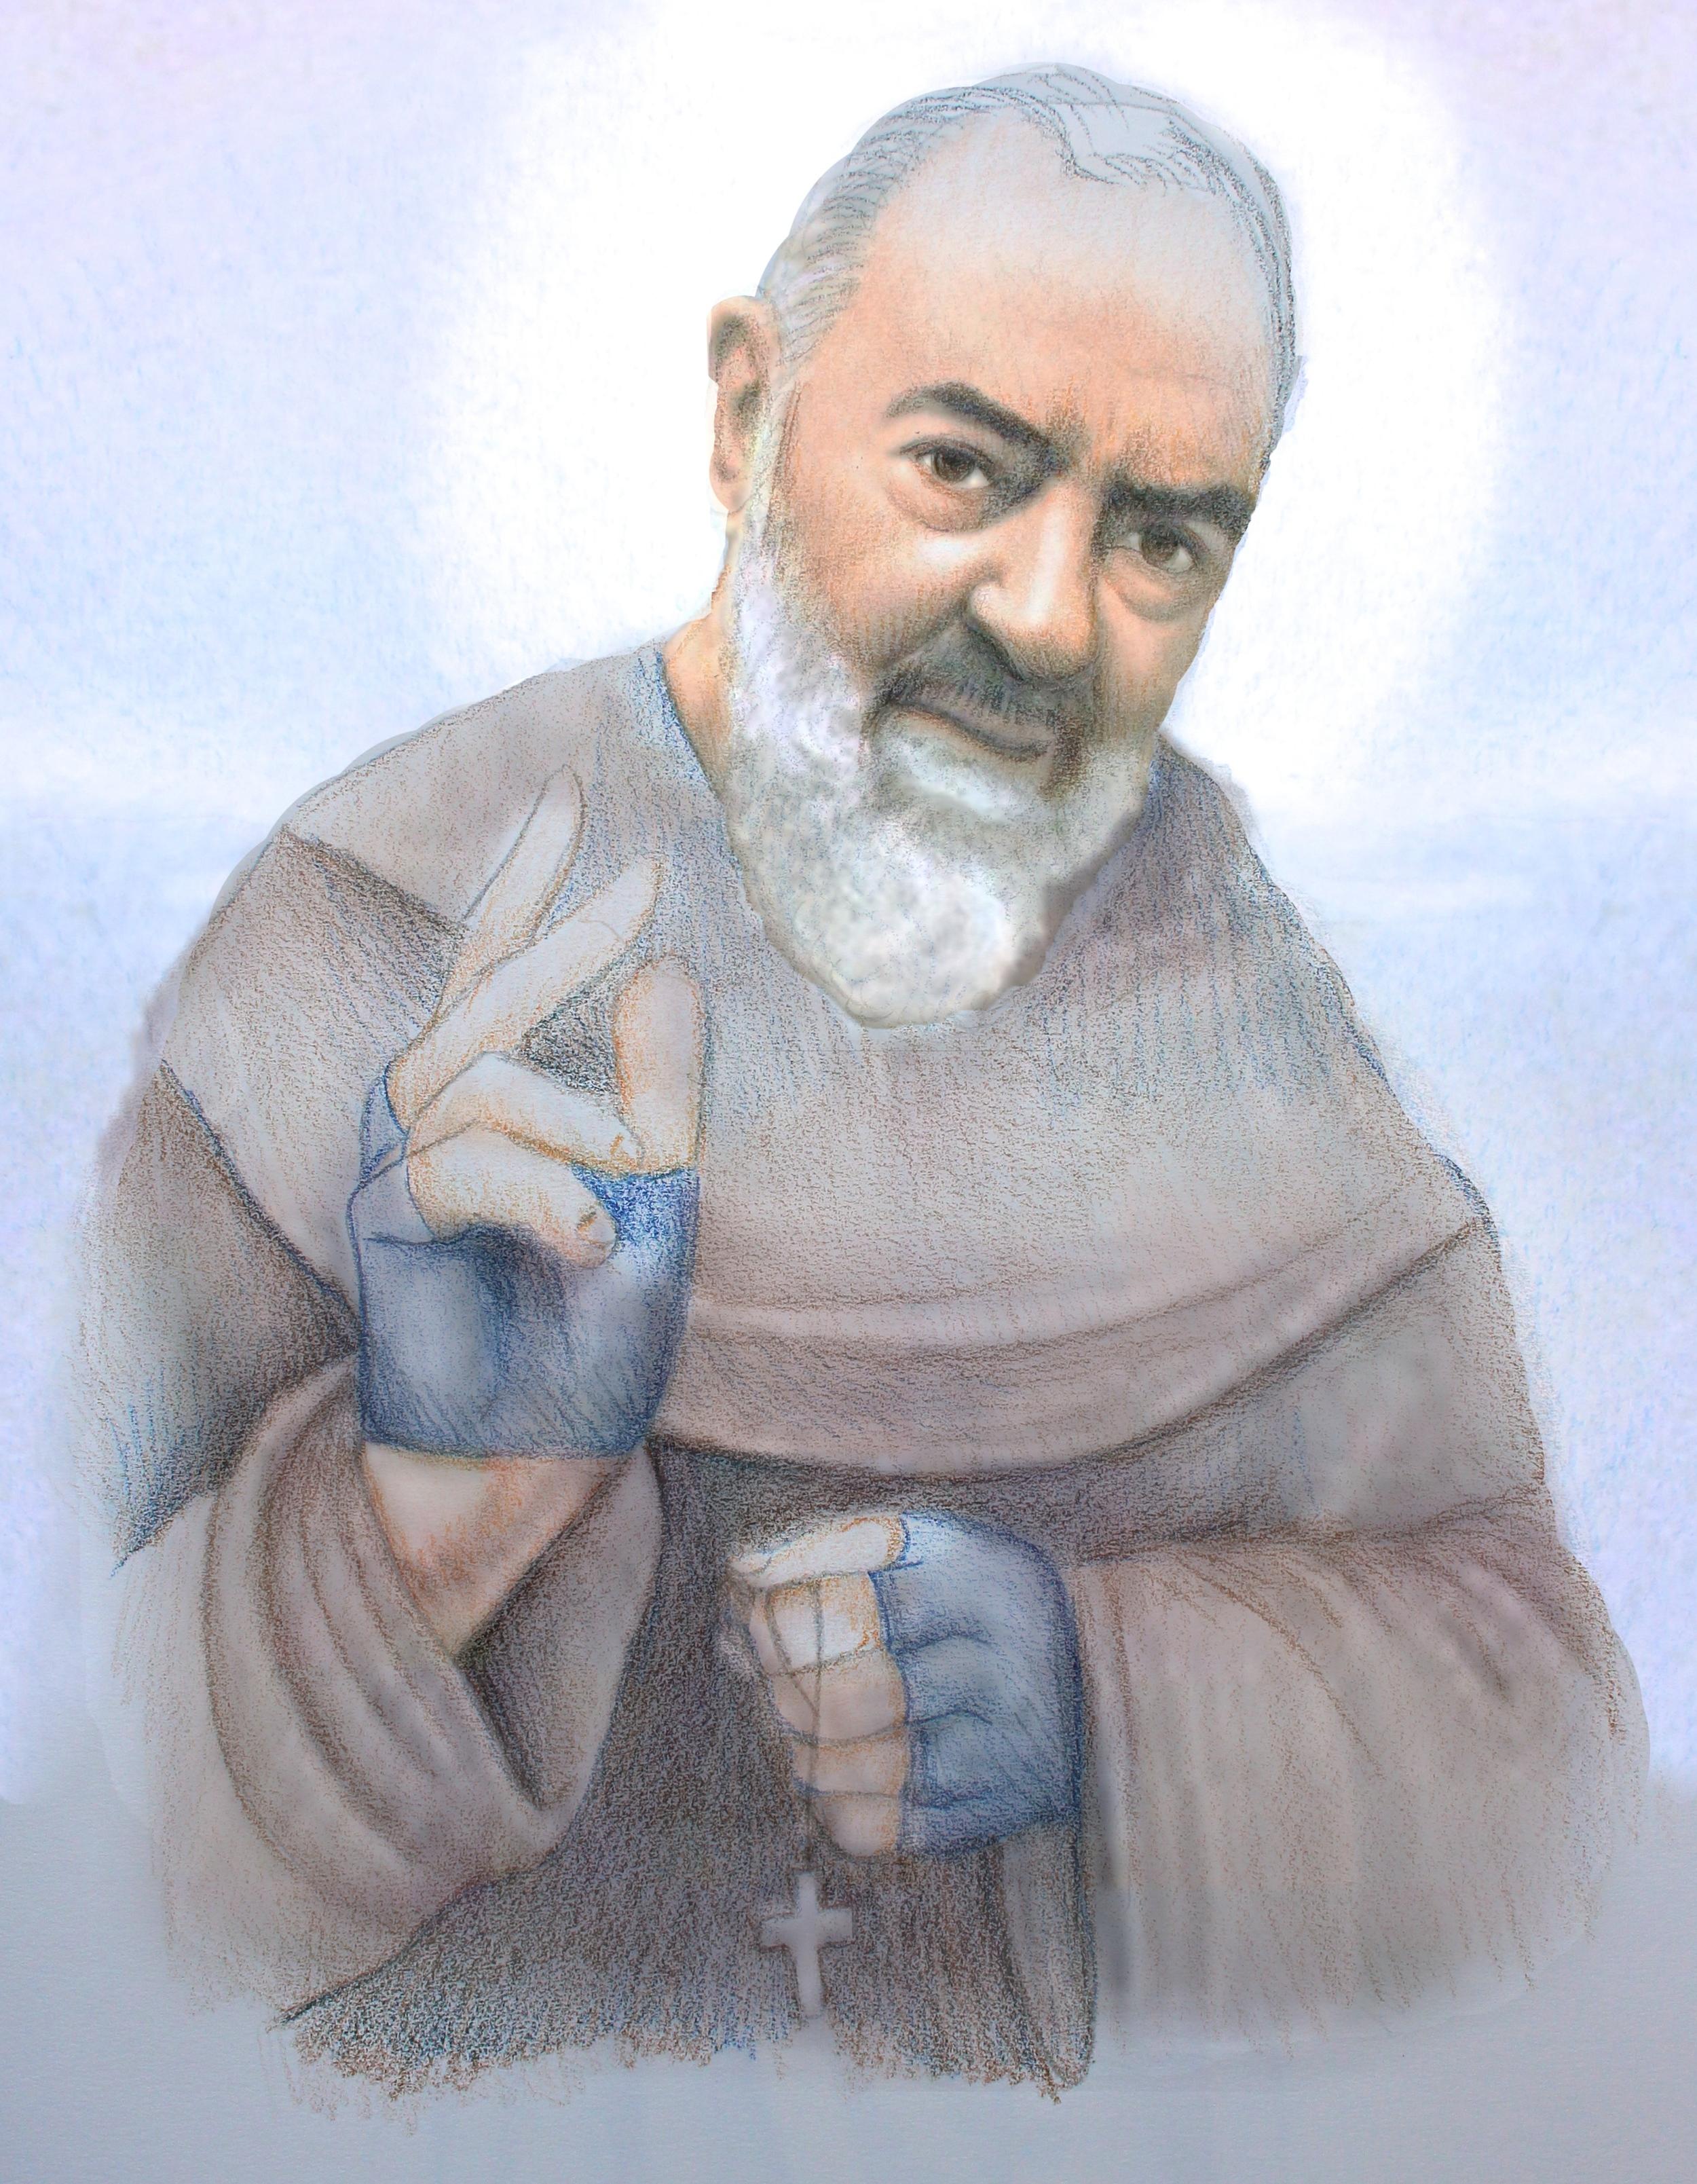 St. Padre Pio copyright @ leadustoheaven.com